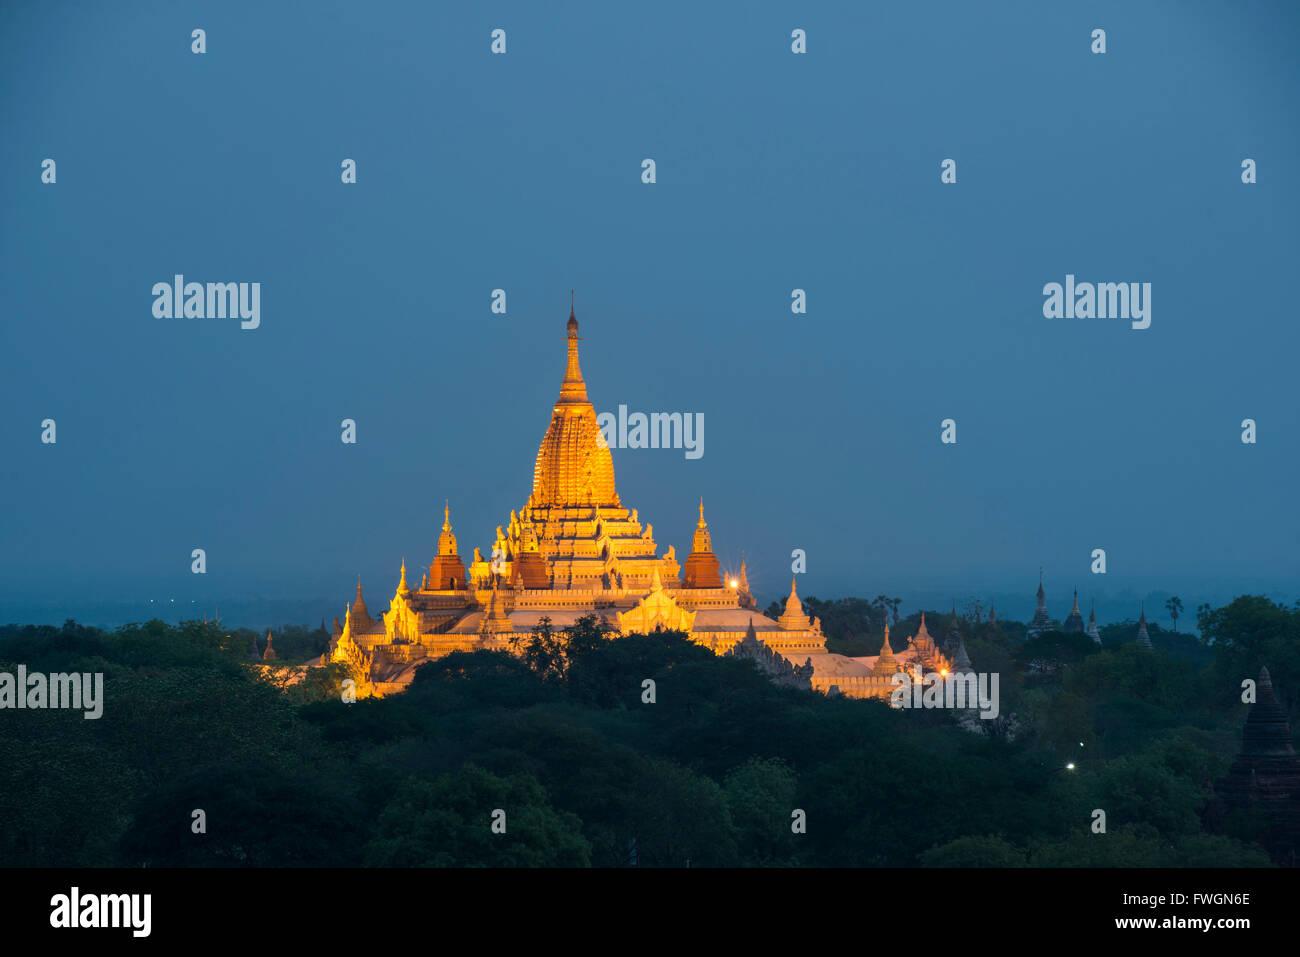 Ananda Temple at night, Temples of Bagan (Pagan), Myanmar (Burma), Asia - Stock Image